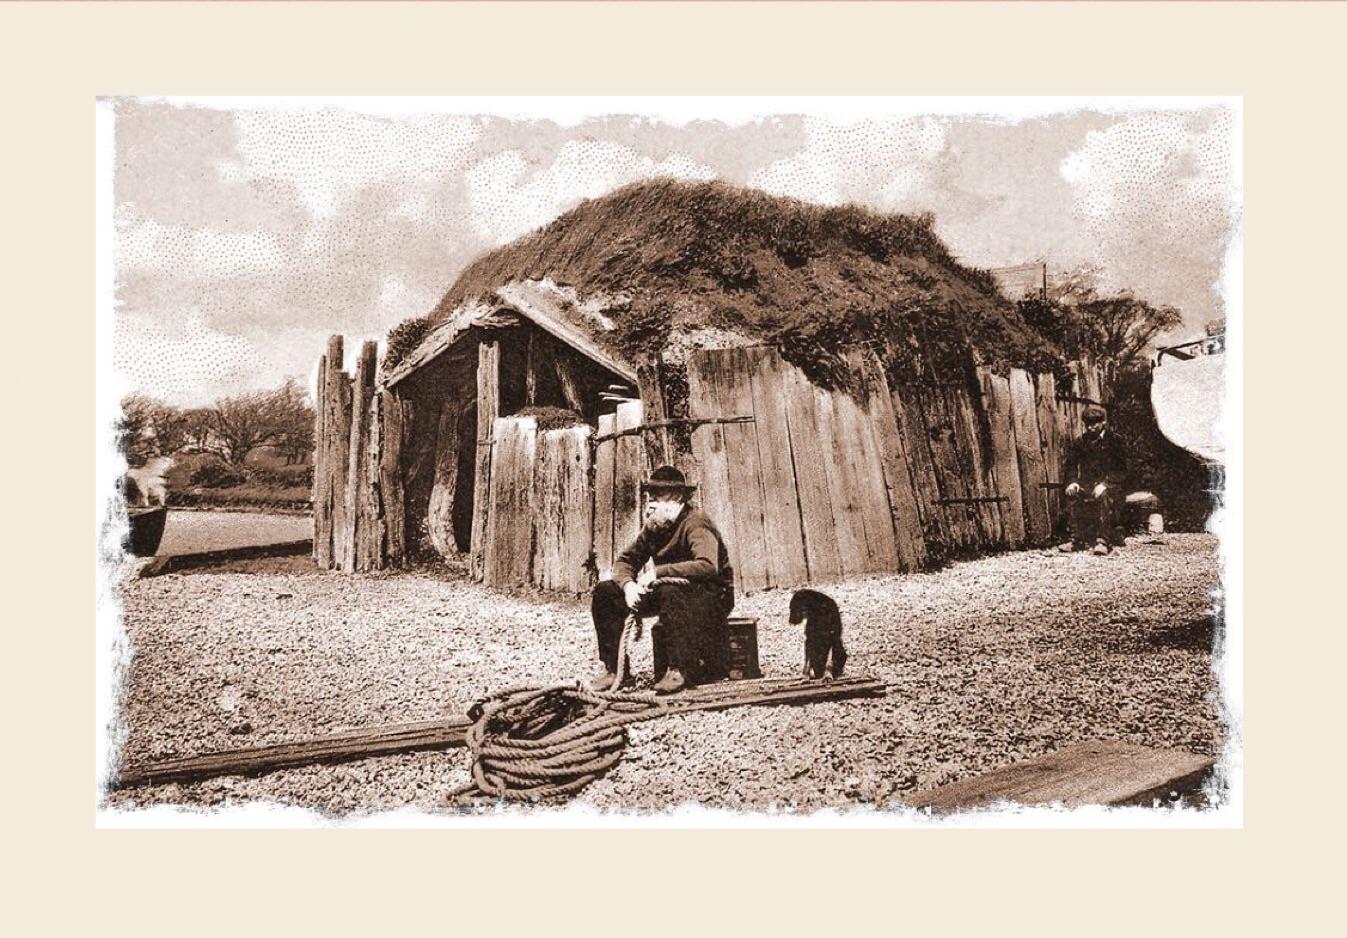 The seaweed hut